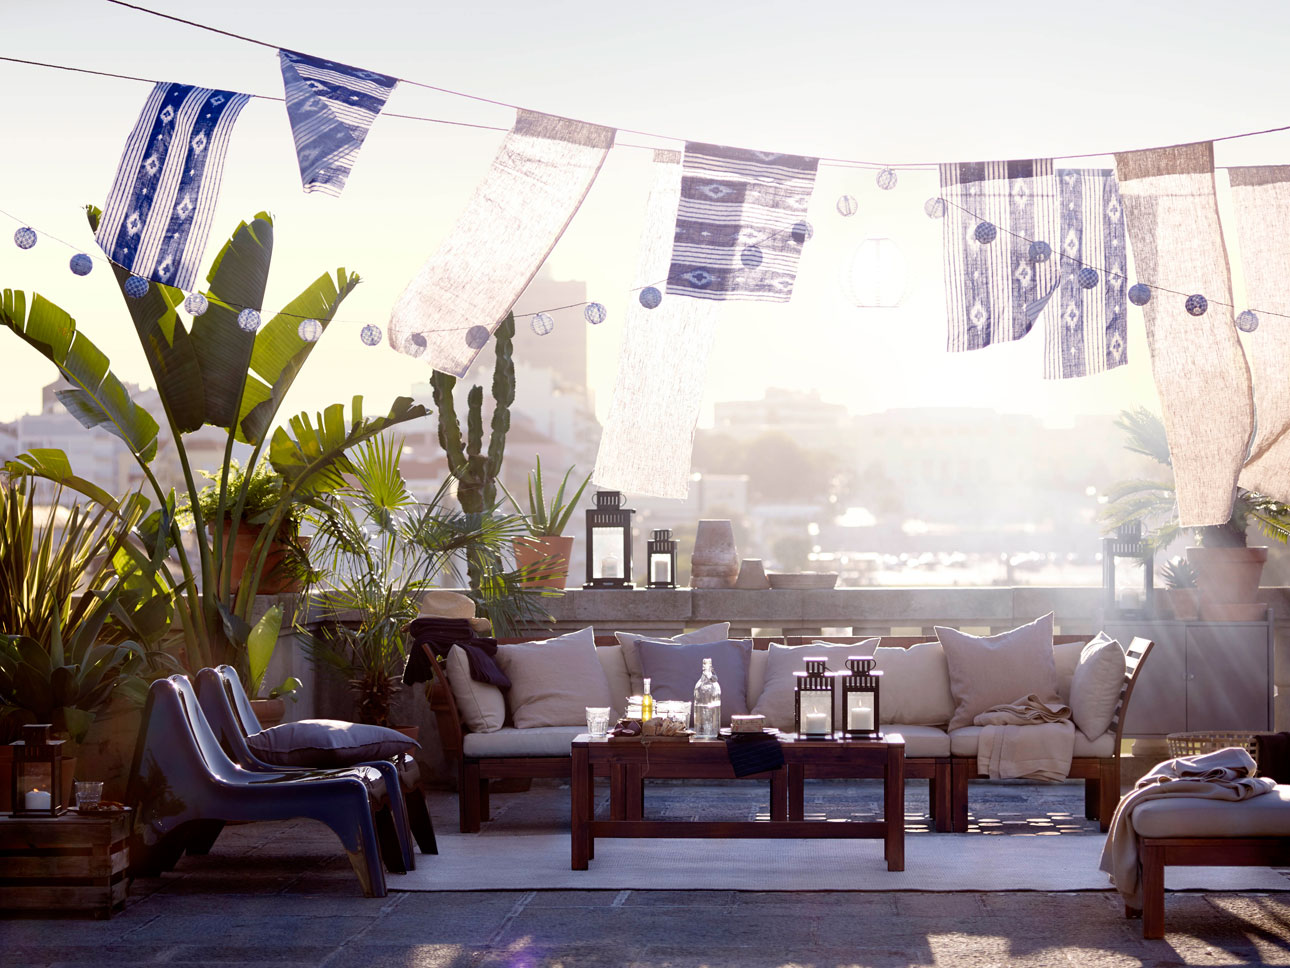 Ikea tuincollectie 2016 buiten eten dakterras